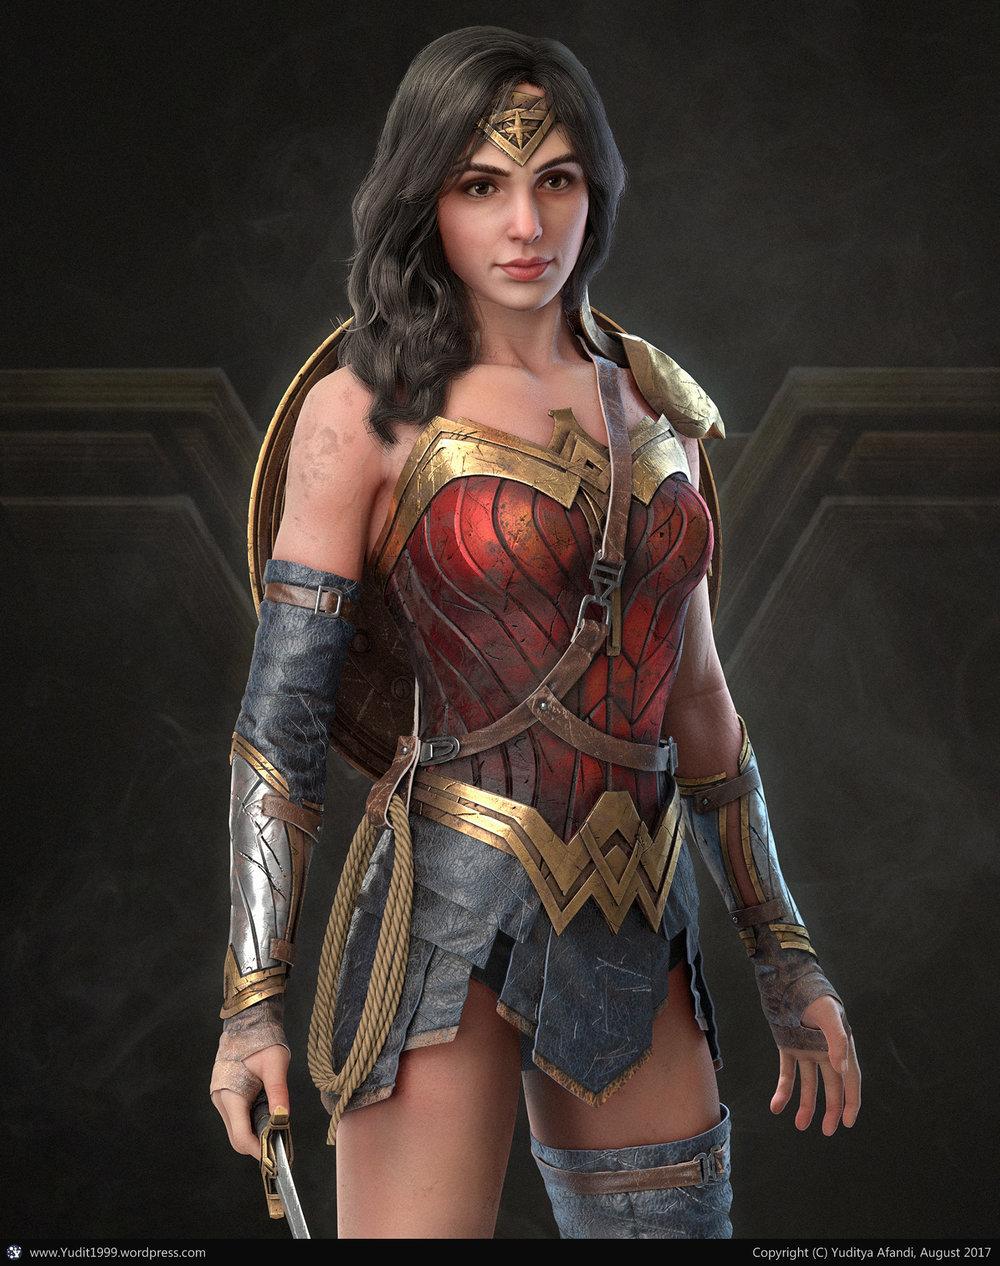 Wonder Woman by Yuditya Afandi, using the Metal and Manmade textures.